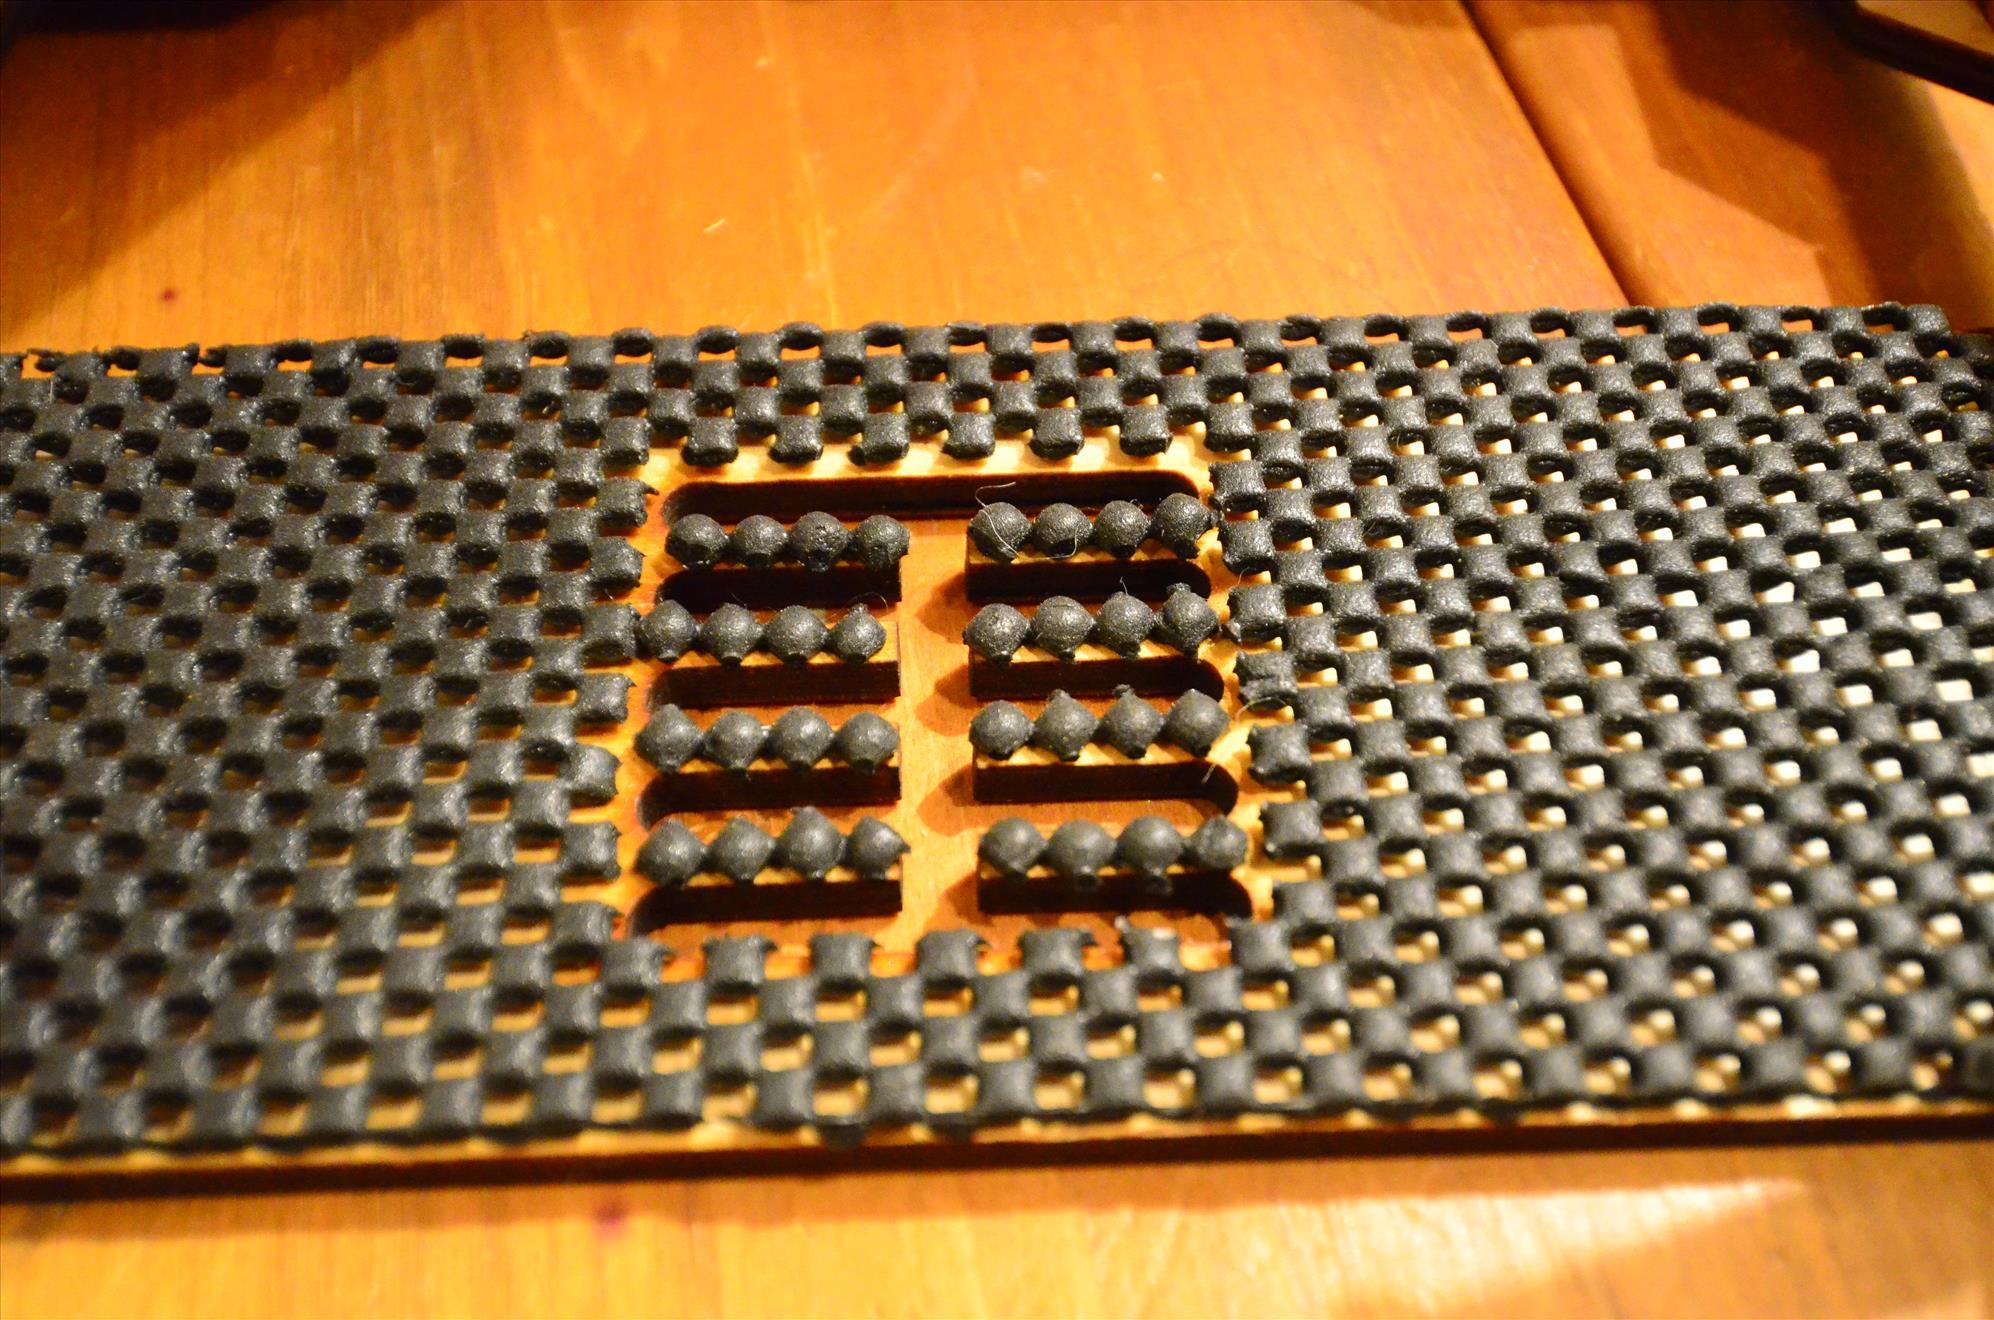 Rubber mat to improve grip